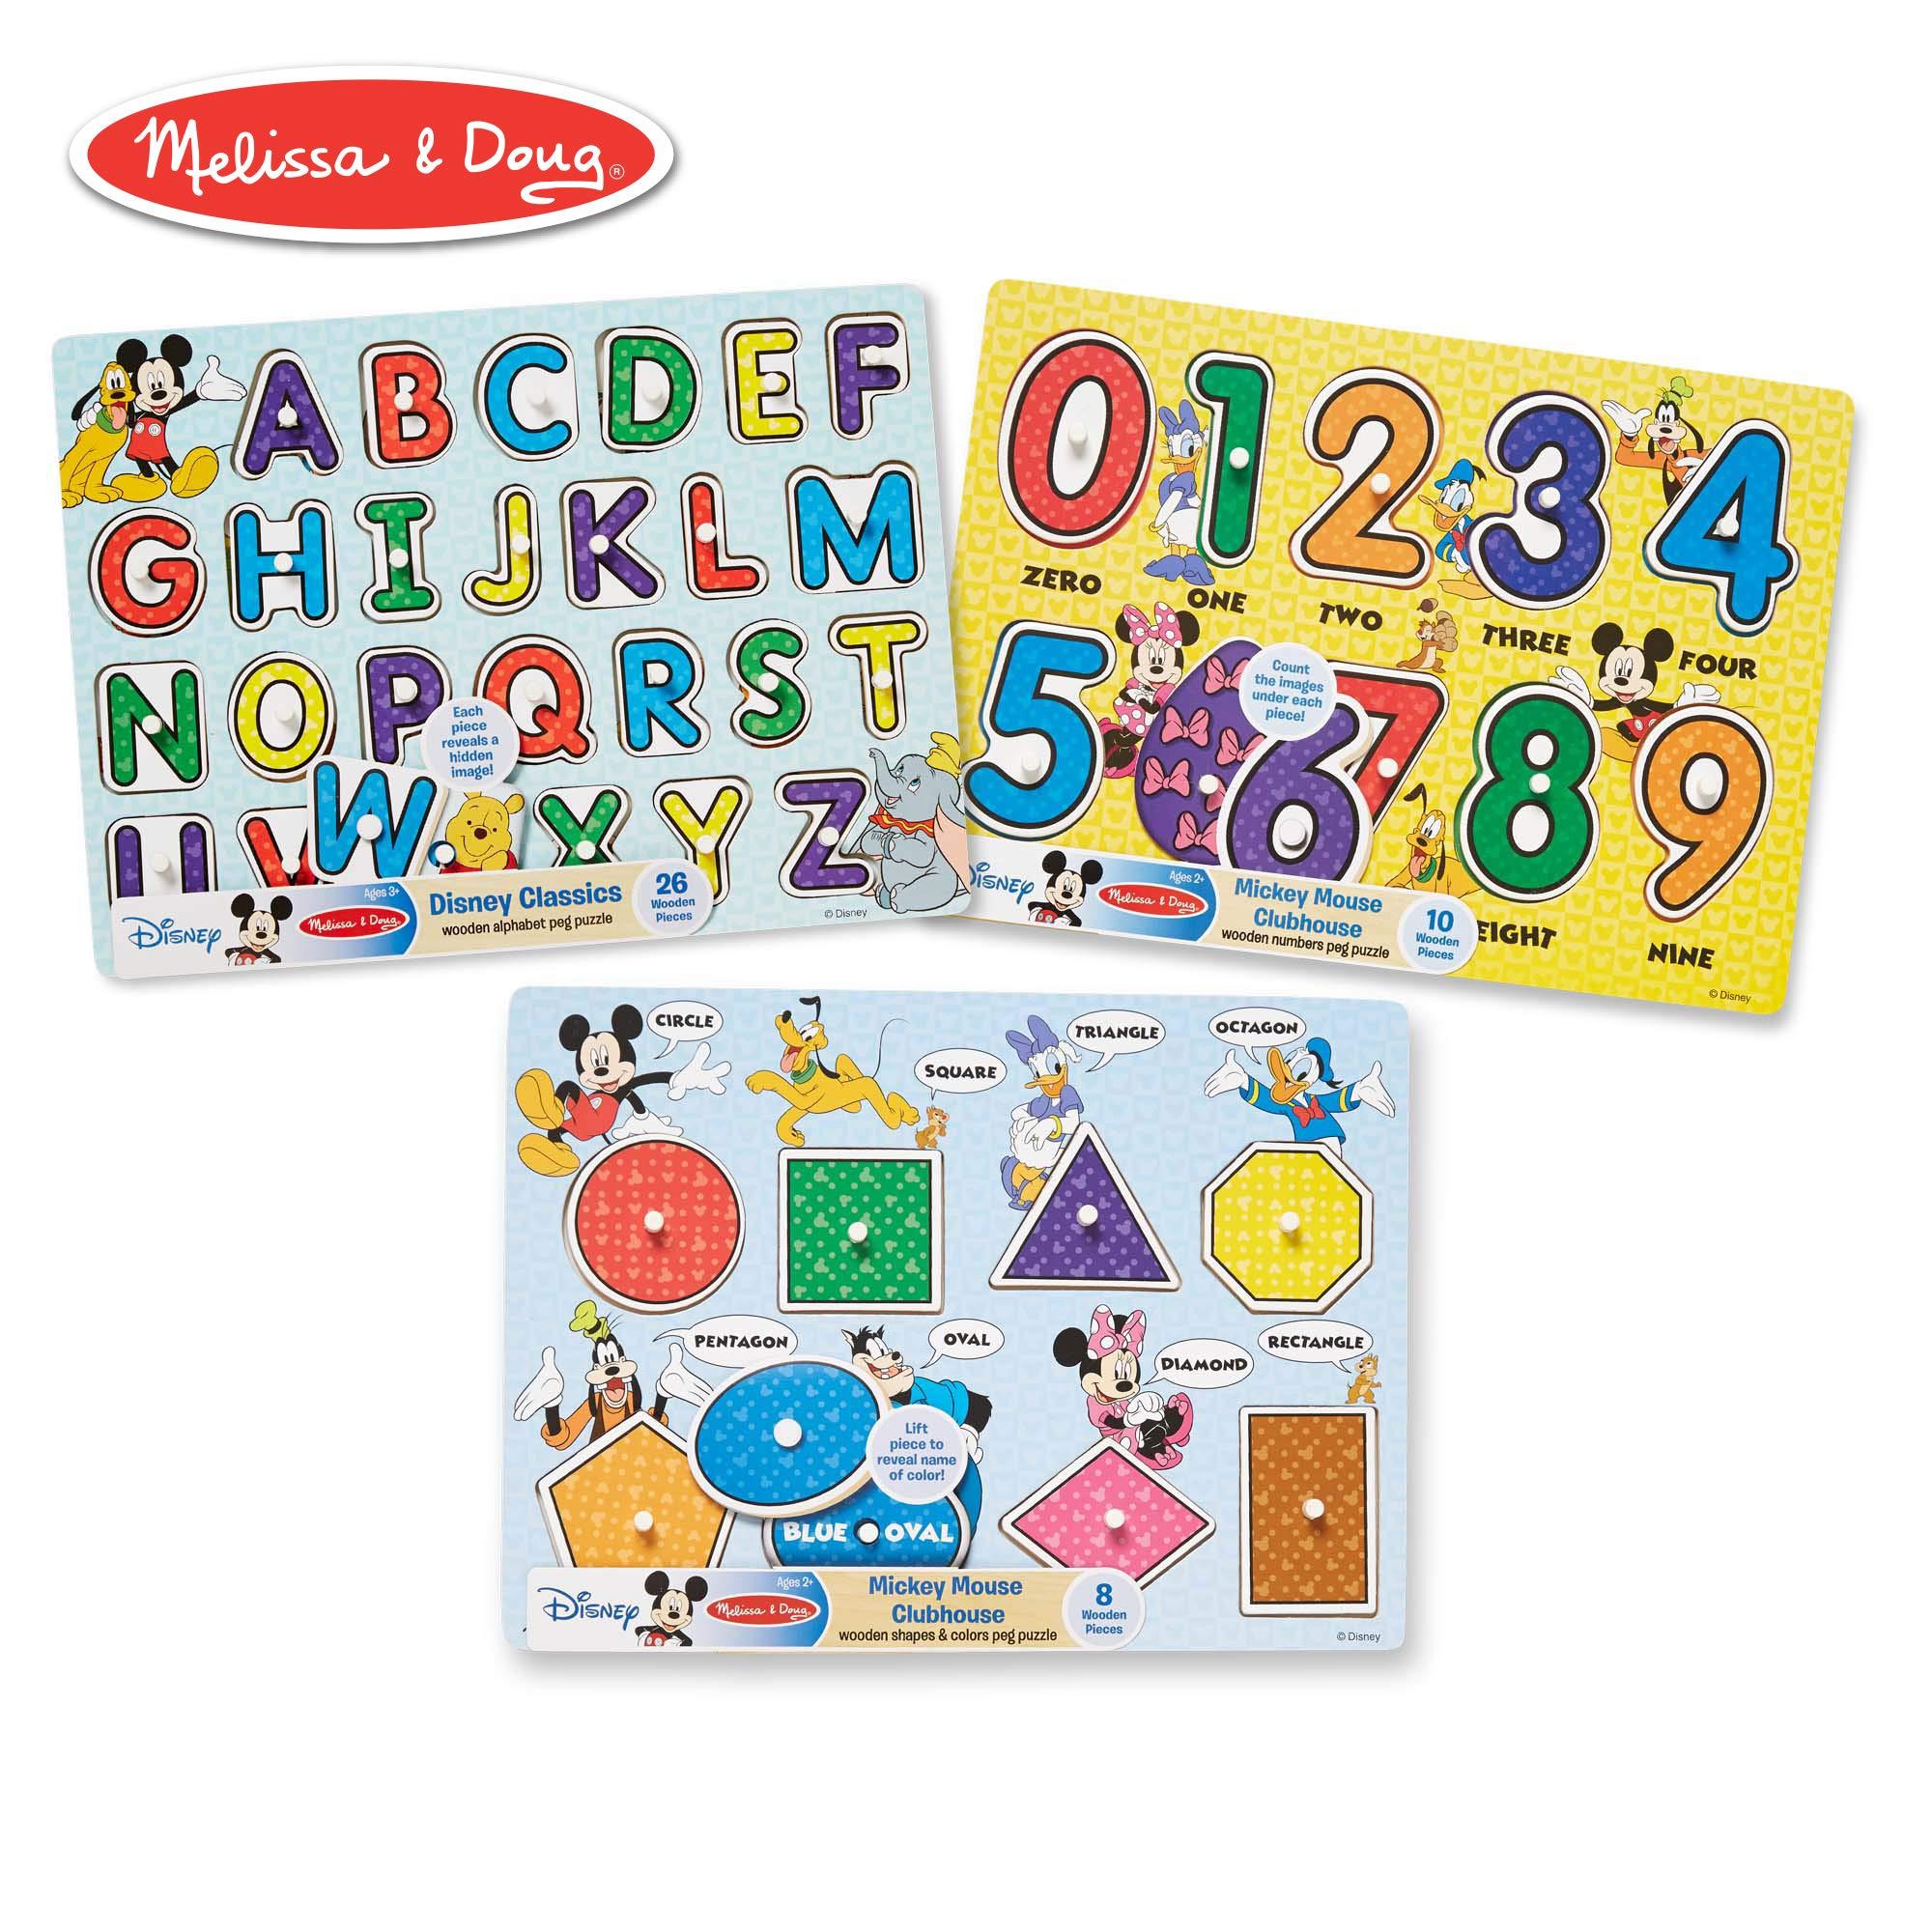 Melissa & Doug Disney Classics Alphabet Wooden Peg Puzzle, Developmental Toys, Sturdy Wooden Construction, 26 Pieces, 0.7'' H x 11.6'' W x 8.5'' L by Melissa & Doug